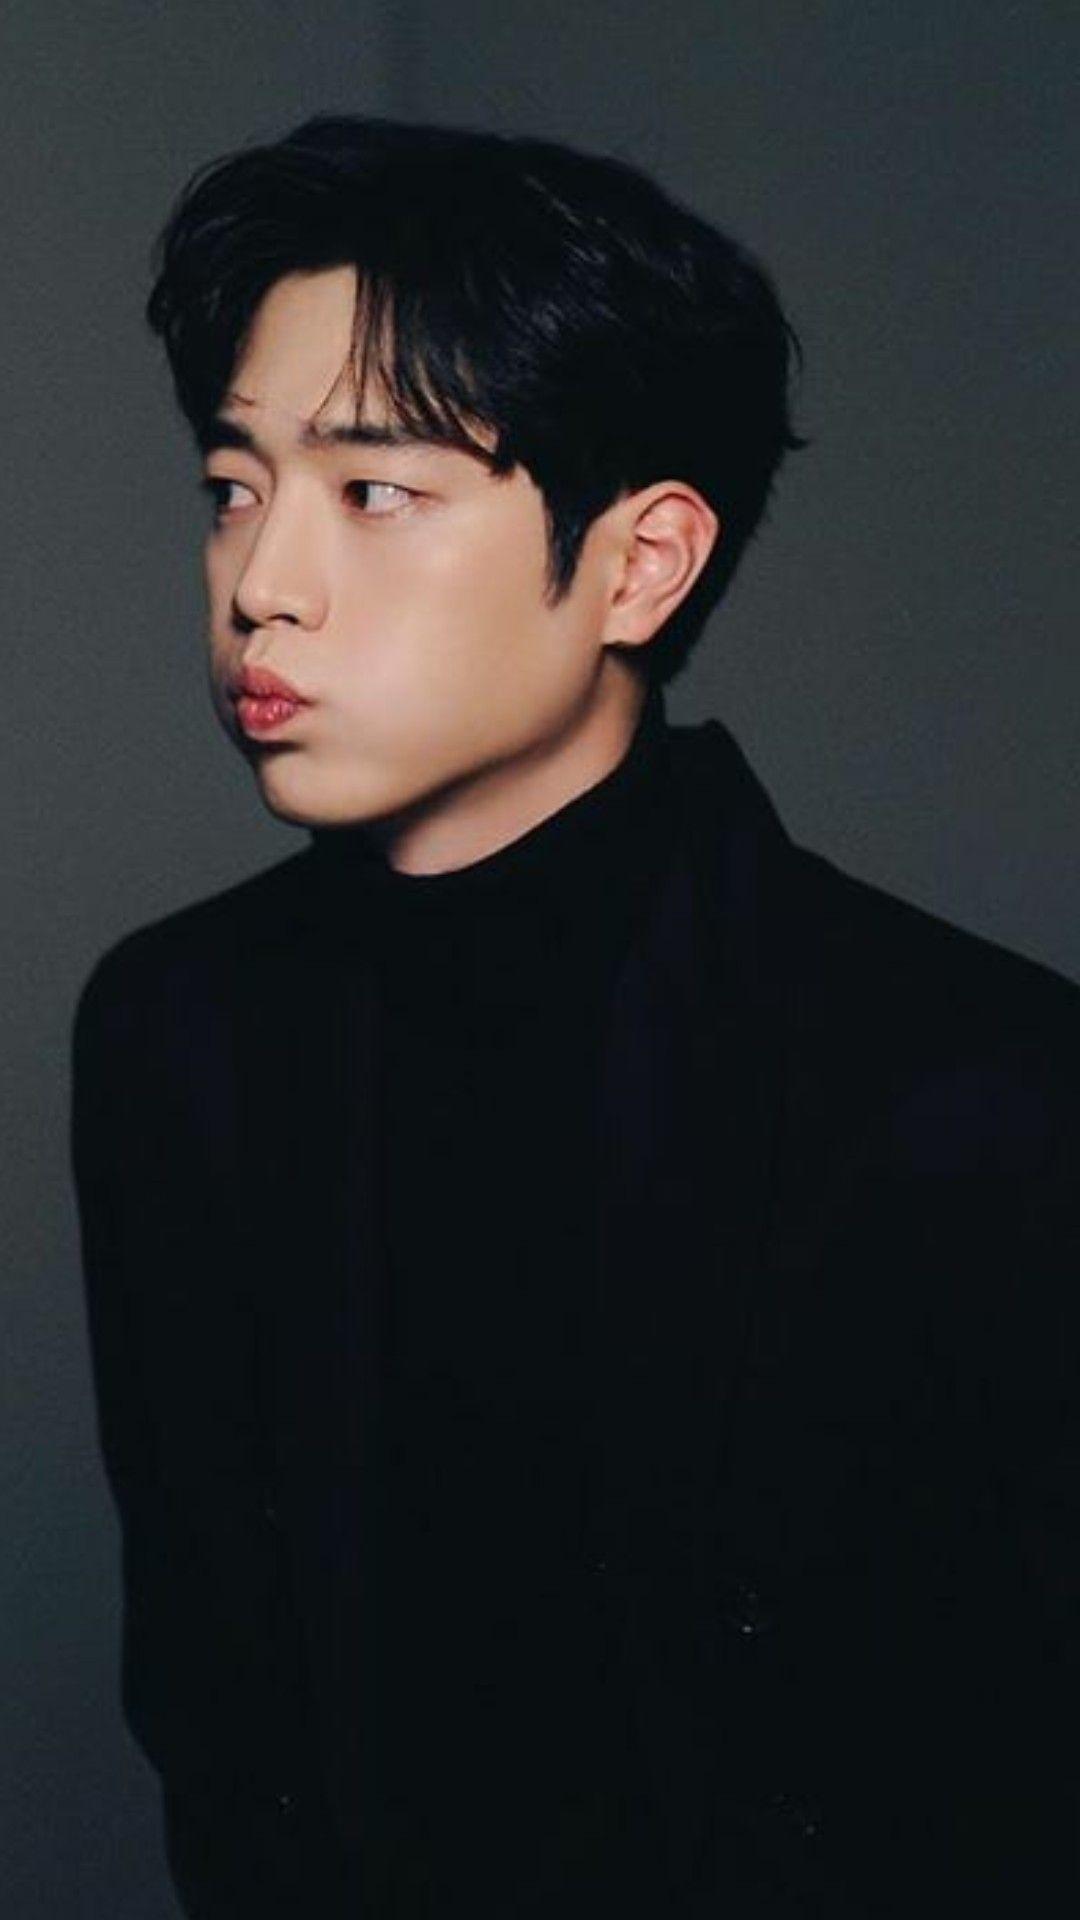 Pin by Ommalicious Me on my kind of man ❤ | Seo kang joon, Seo